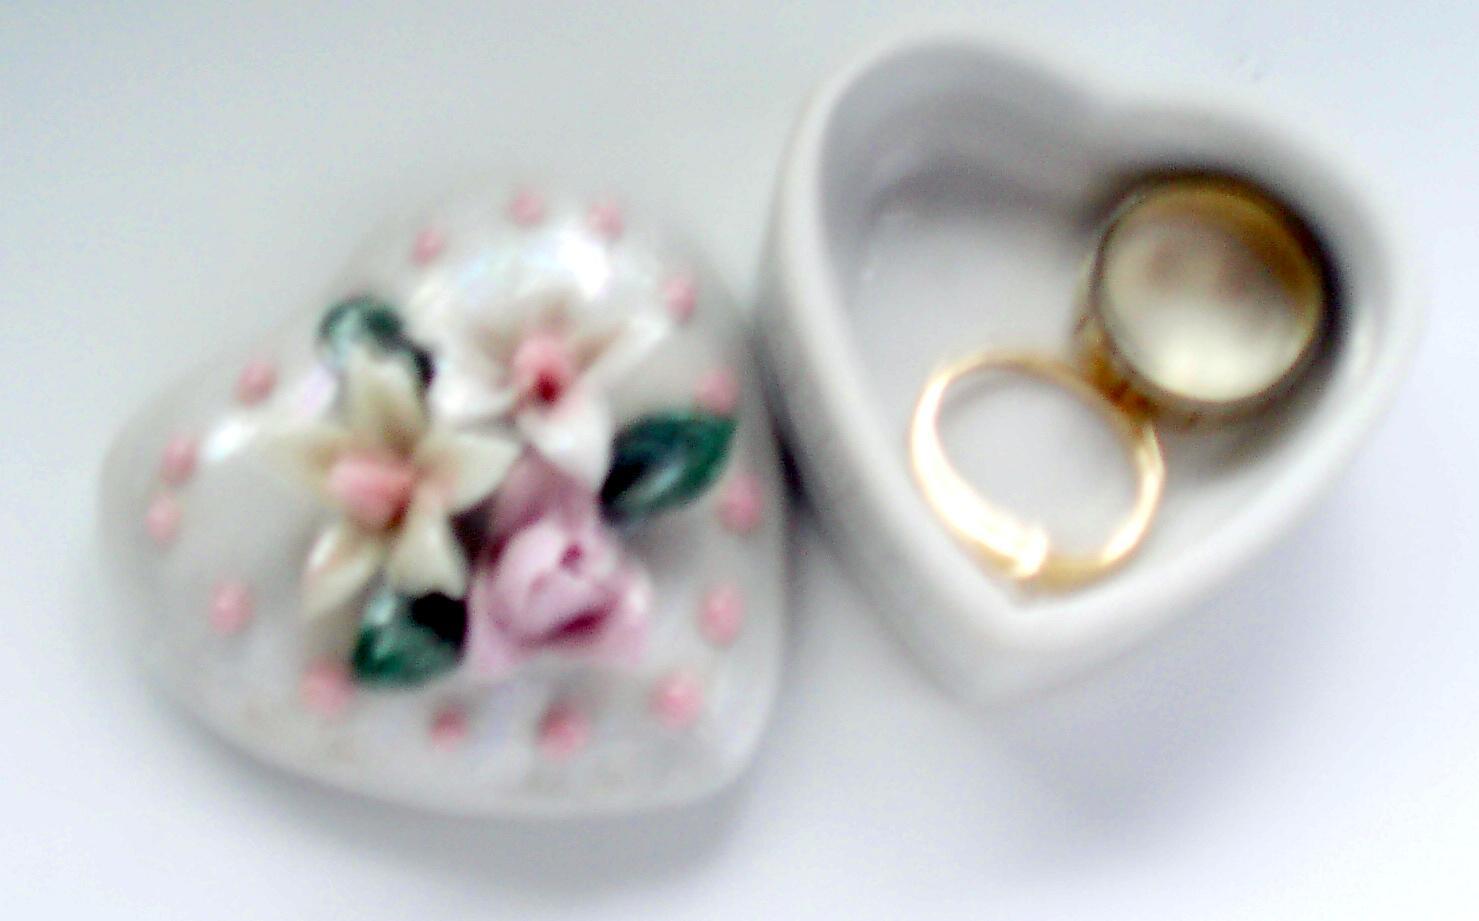 Srdce na prstienky - Obrázok č. 1